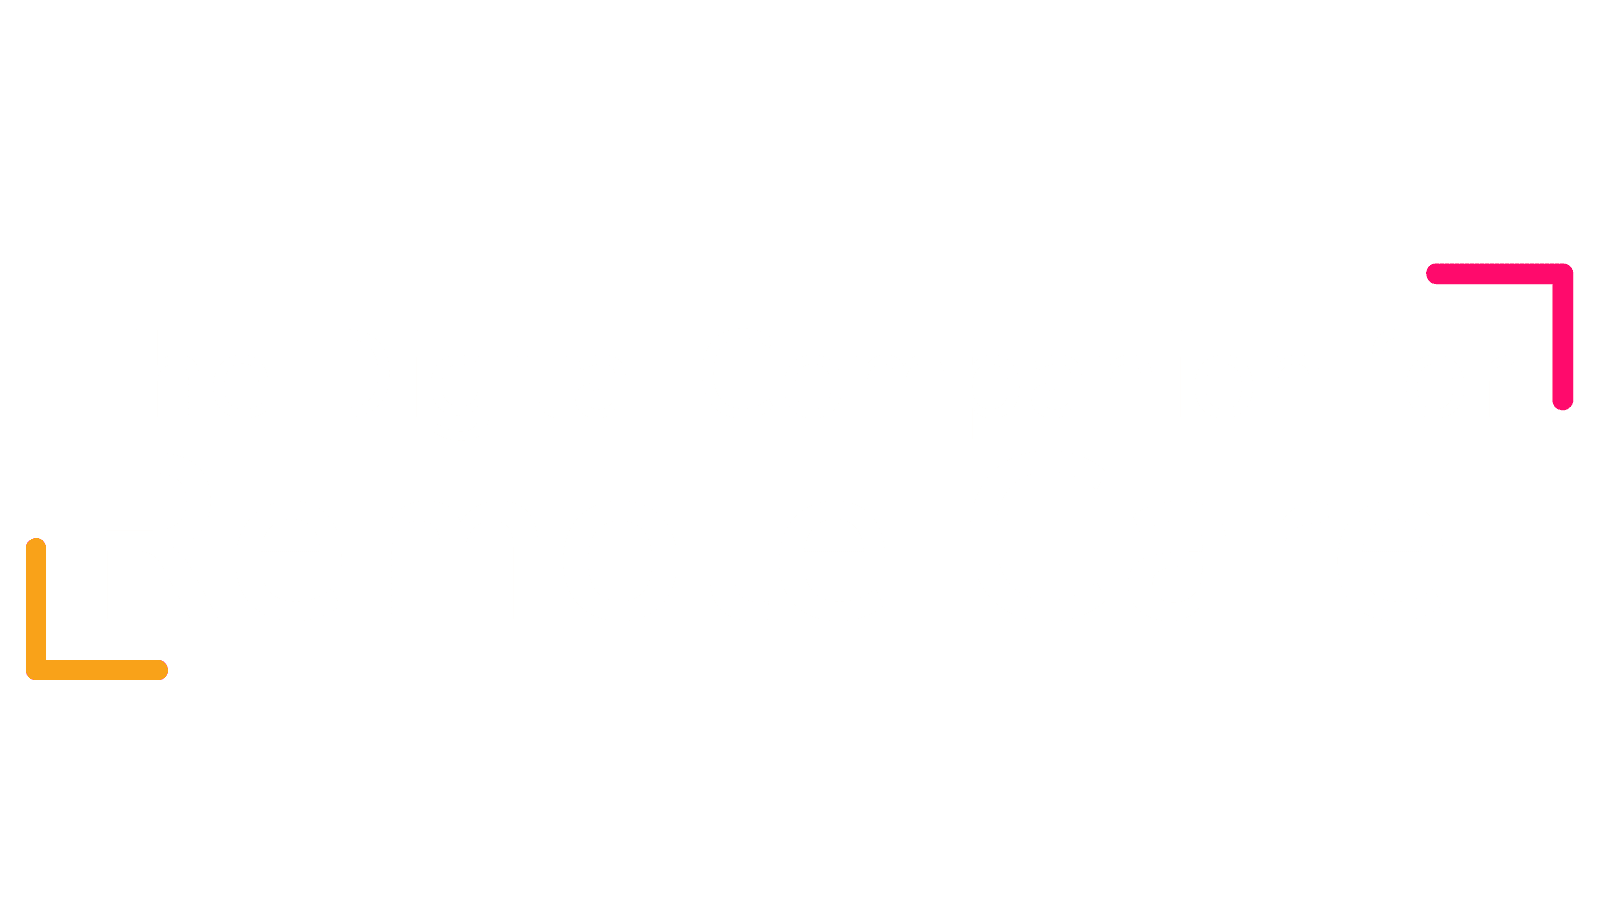 The digital companion for remote care white png